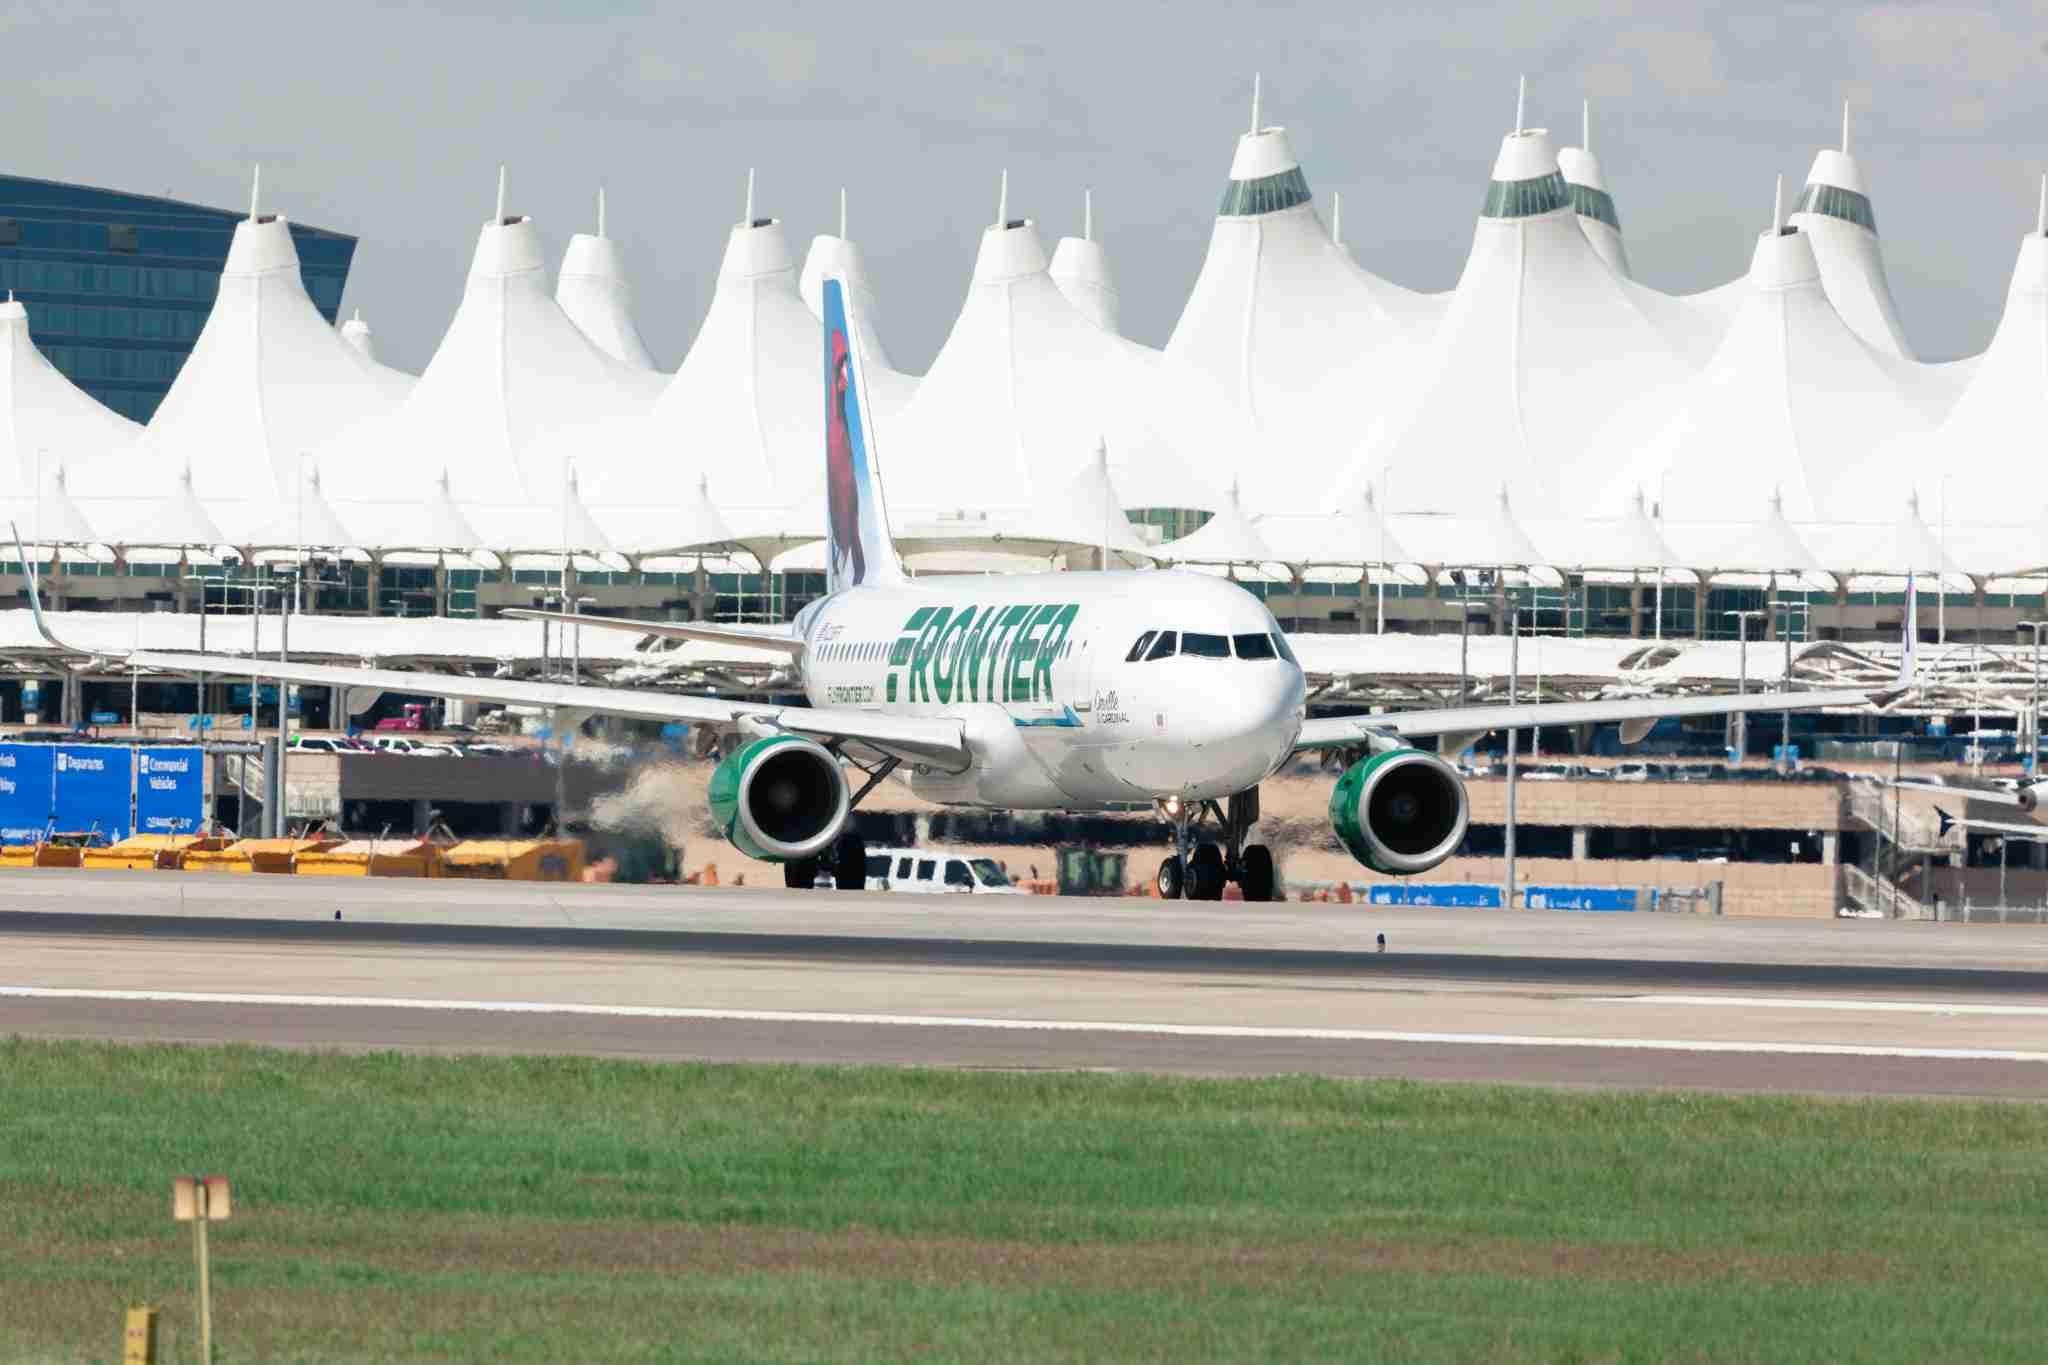 (Photo courtesy of Denver airport)